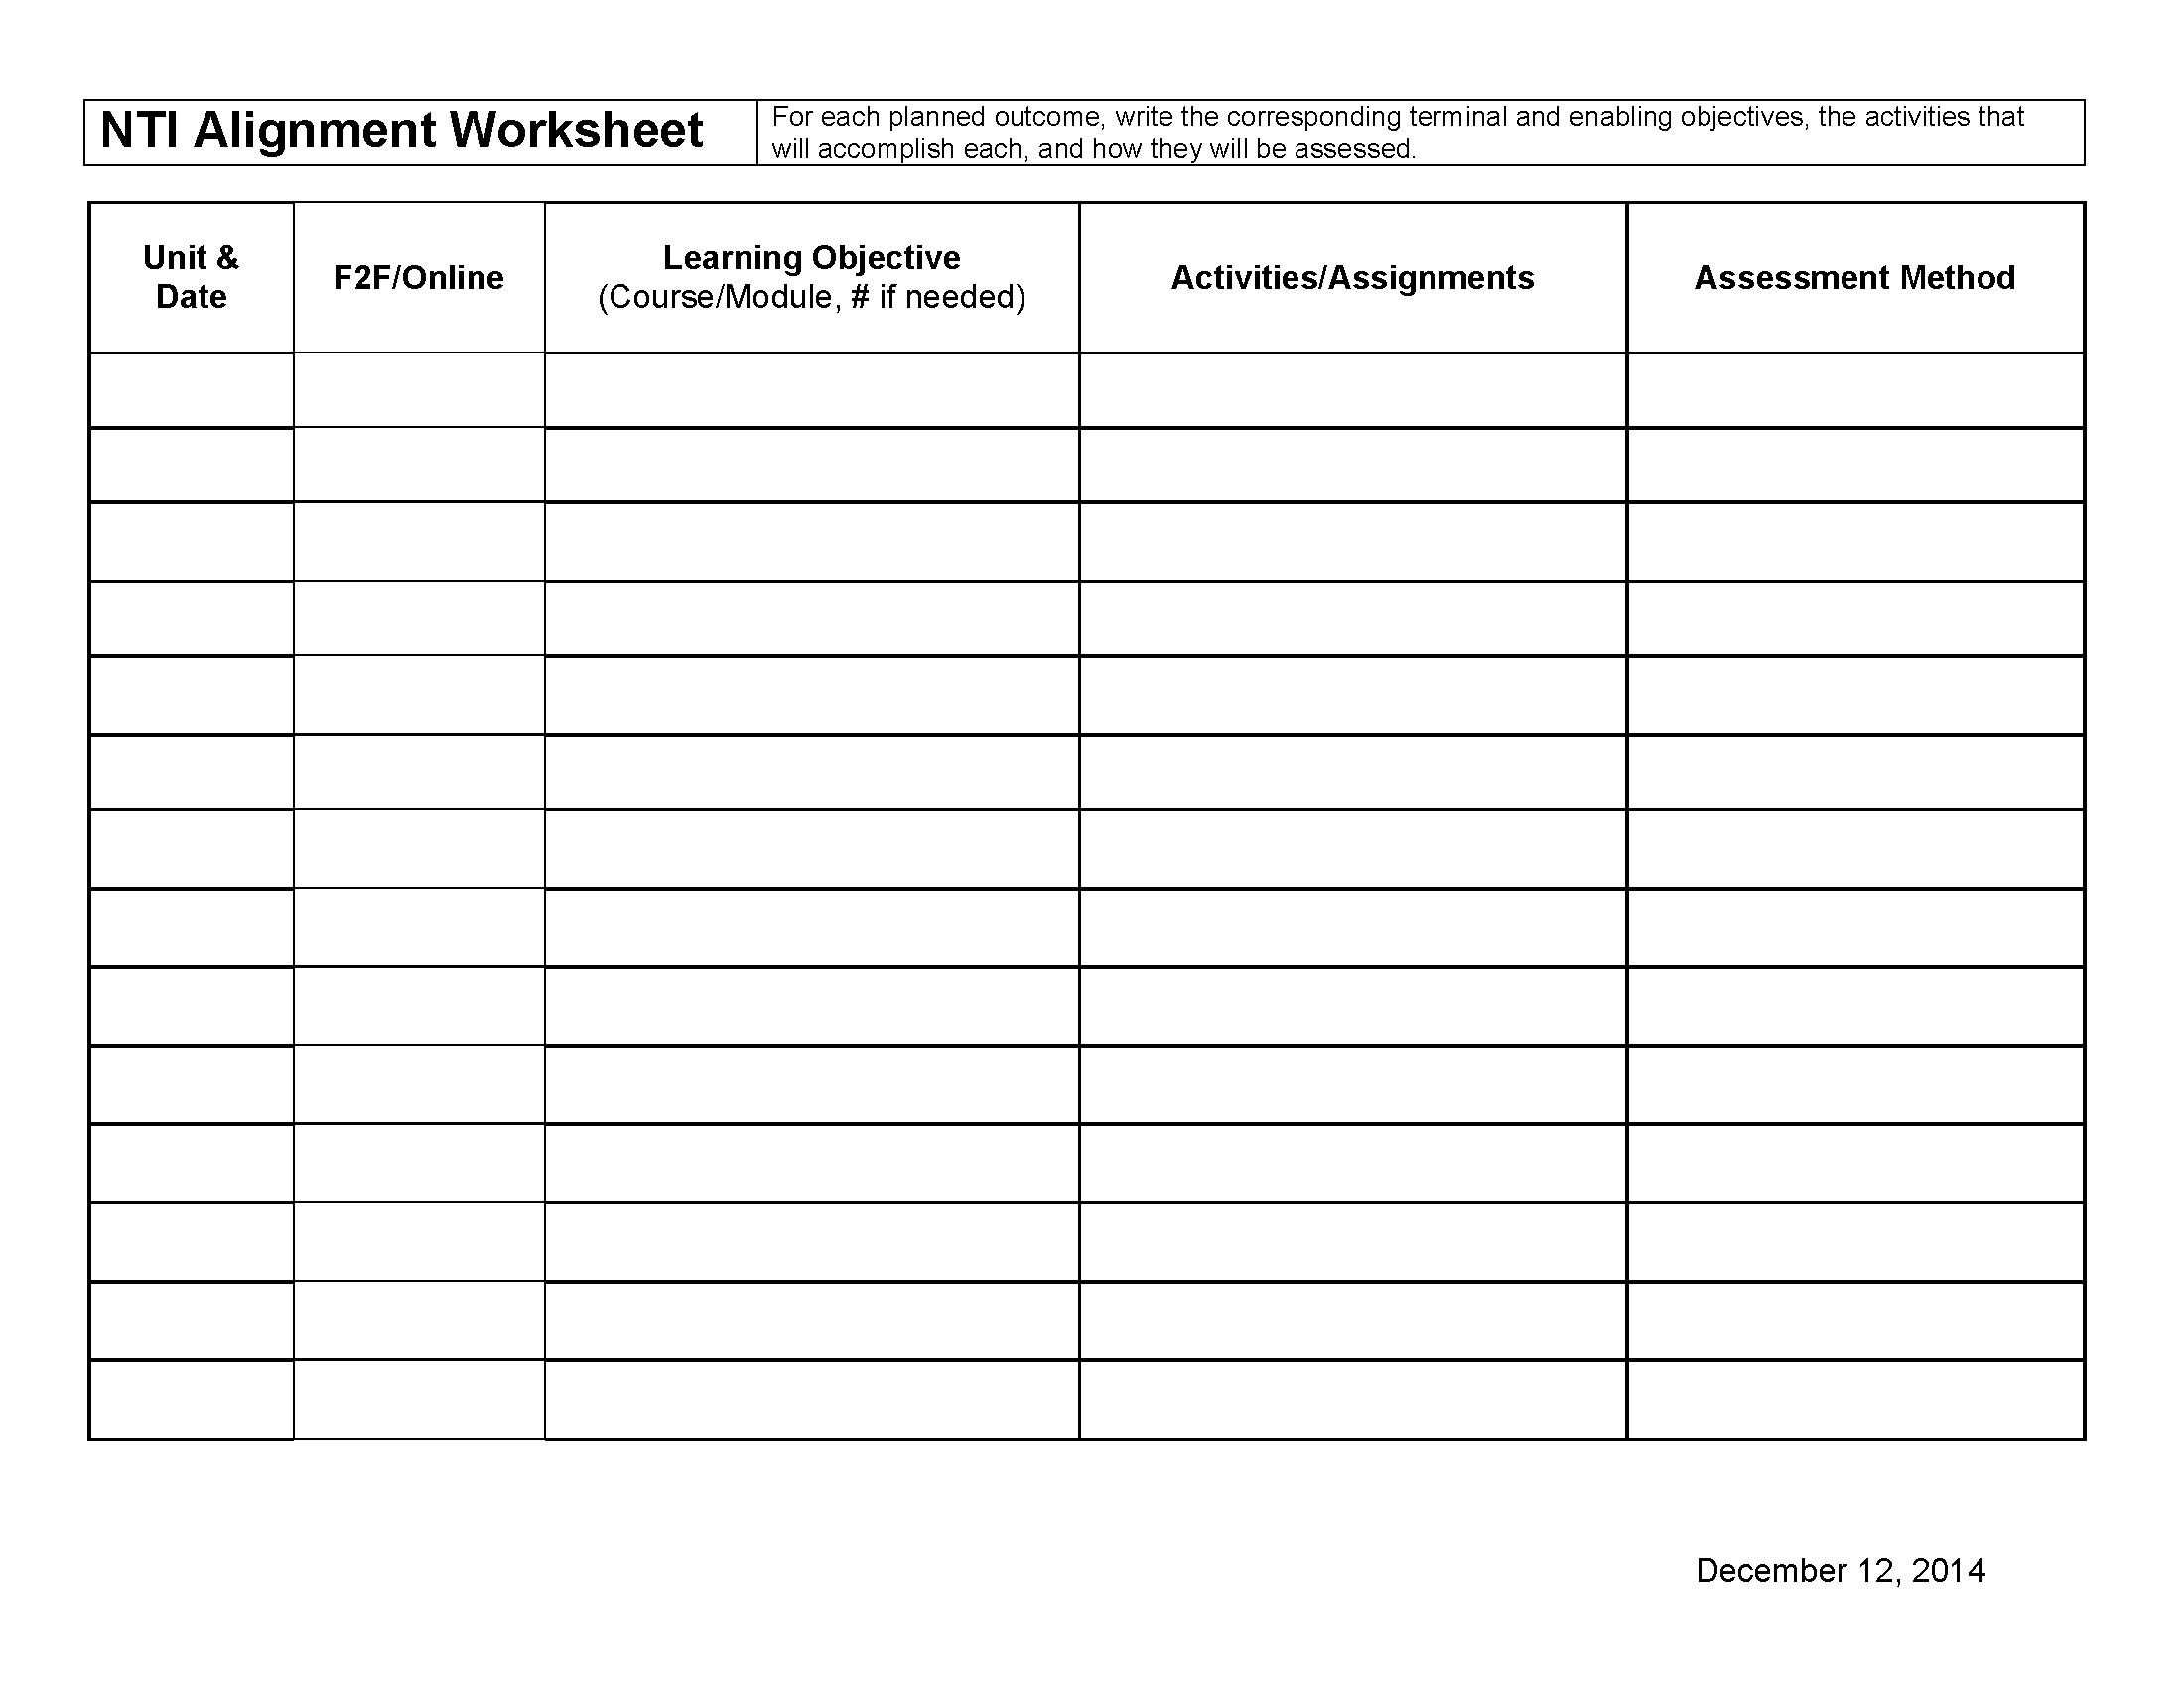 Hybrid Course Alignment Worksheet Fredrick W Baker Iii